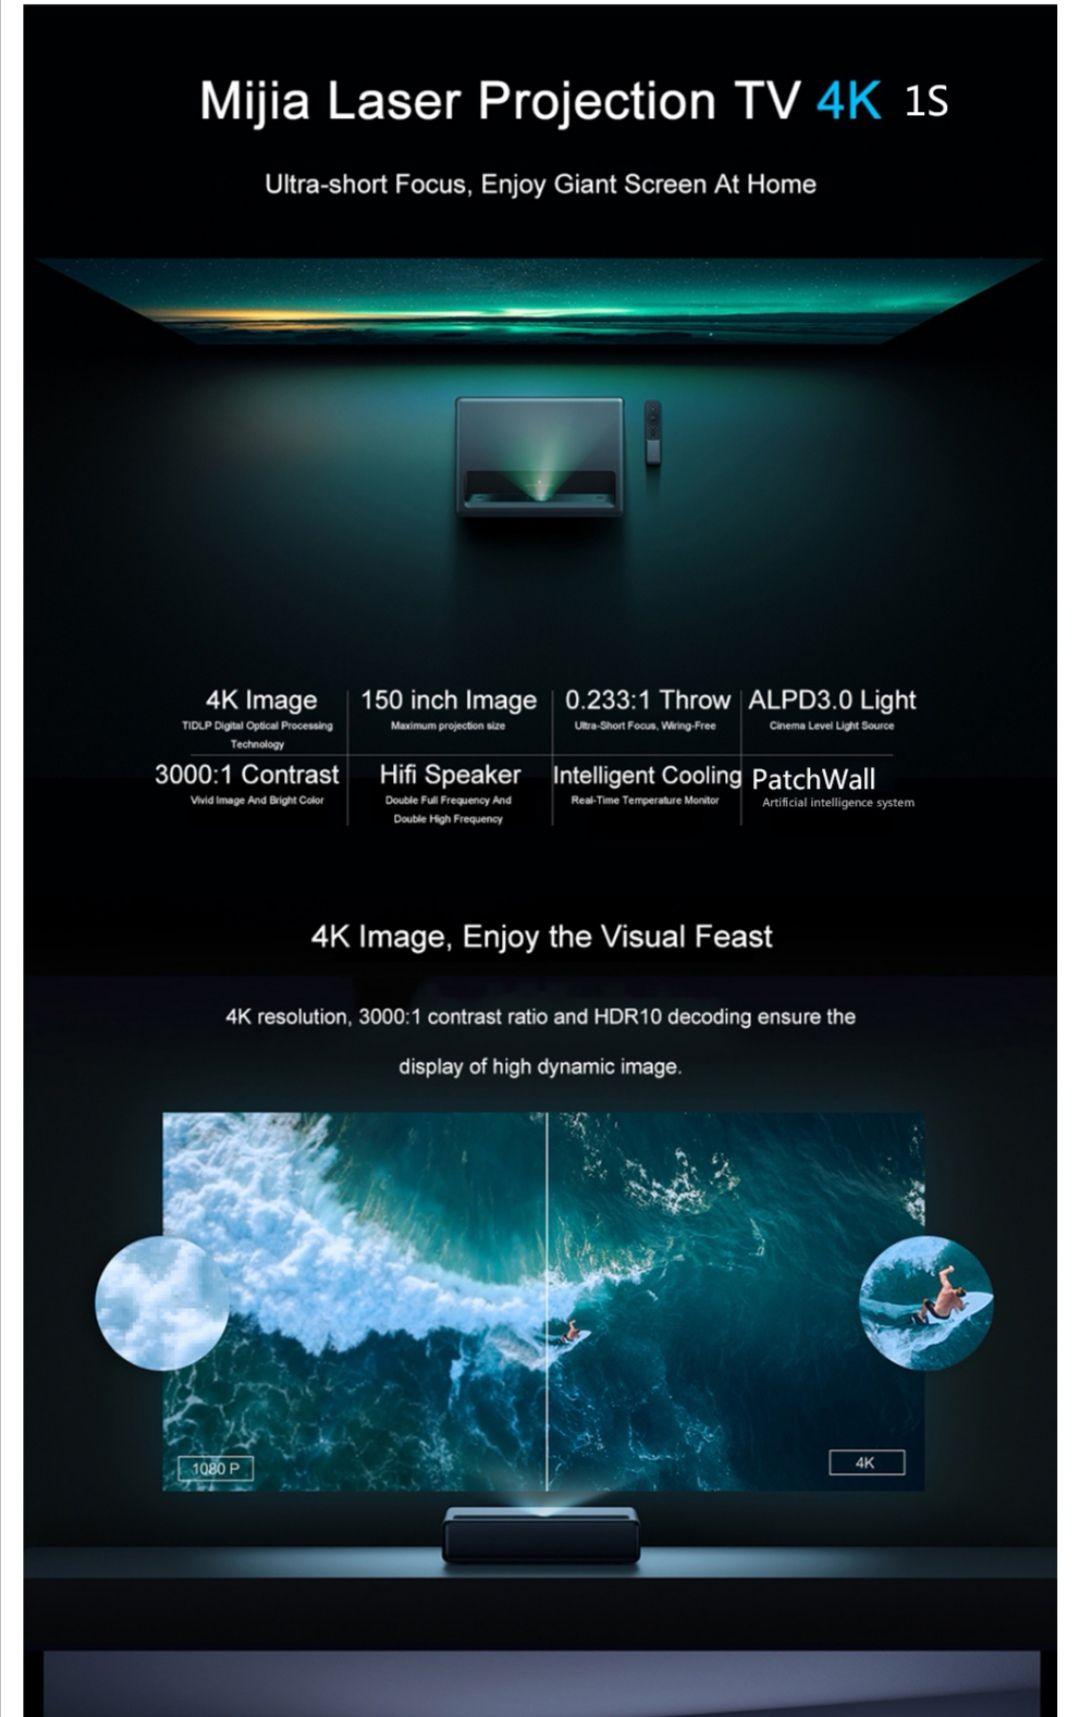 Nieuwe versie Xiaomi Mijia 1S 4K Cinema Laser Projector 2000 ANSI Lumens 150 inch ALPD 4K 3D BT 4.0 MIUI TV Xiaomi Projector eu shipping